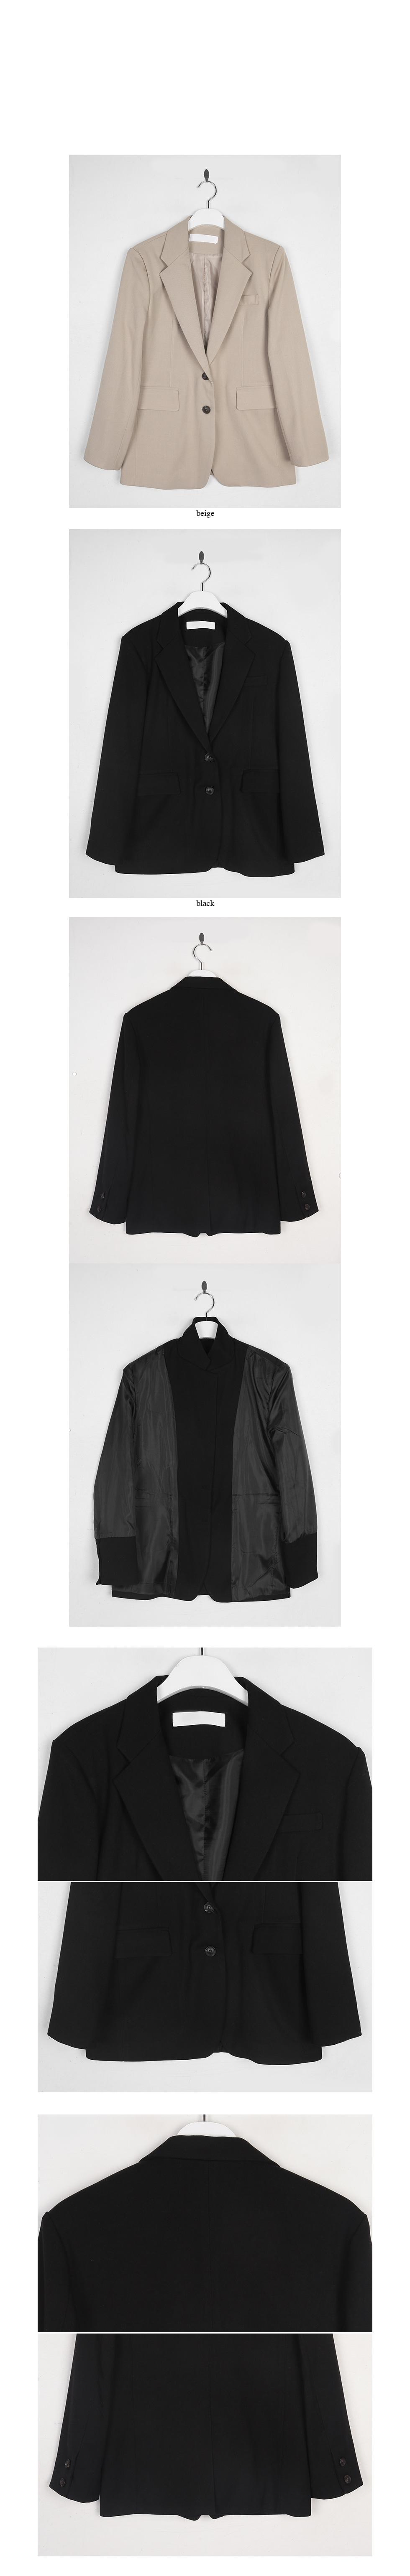 cotton 2-button single jacket